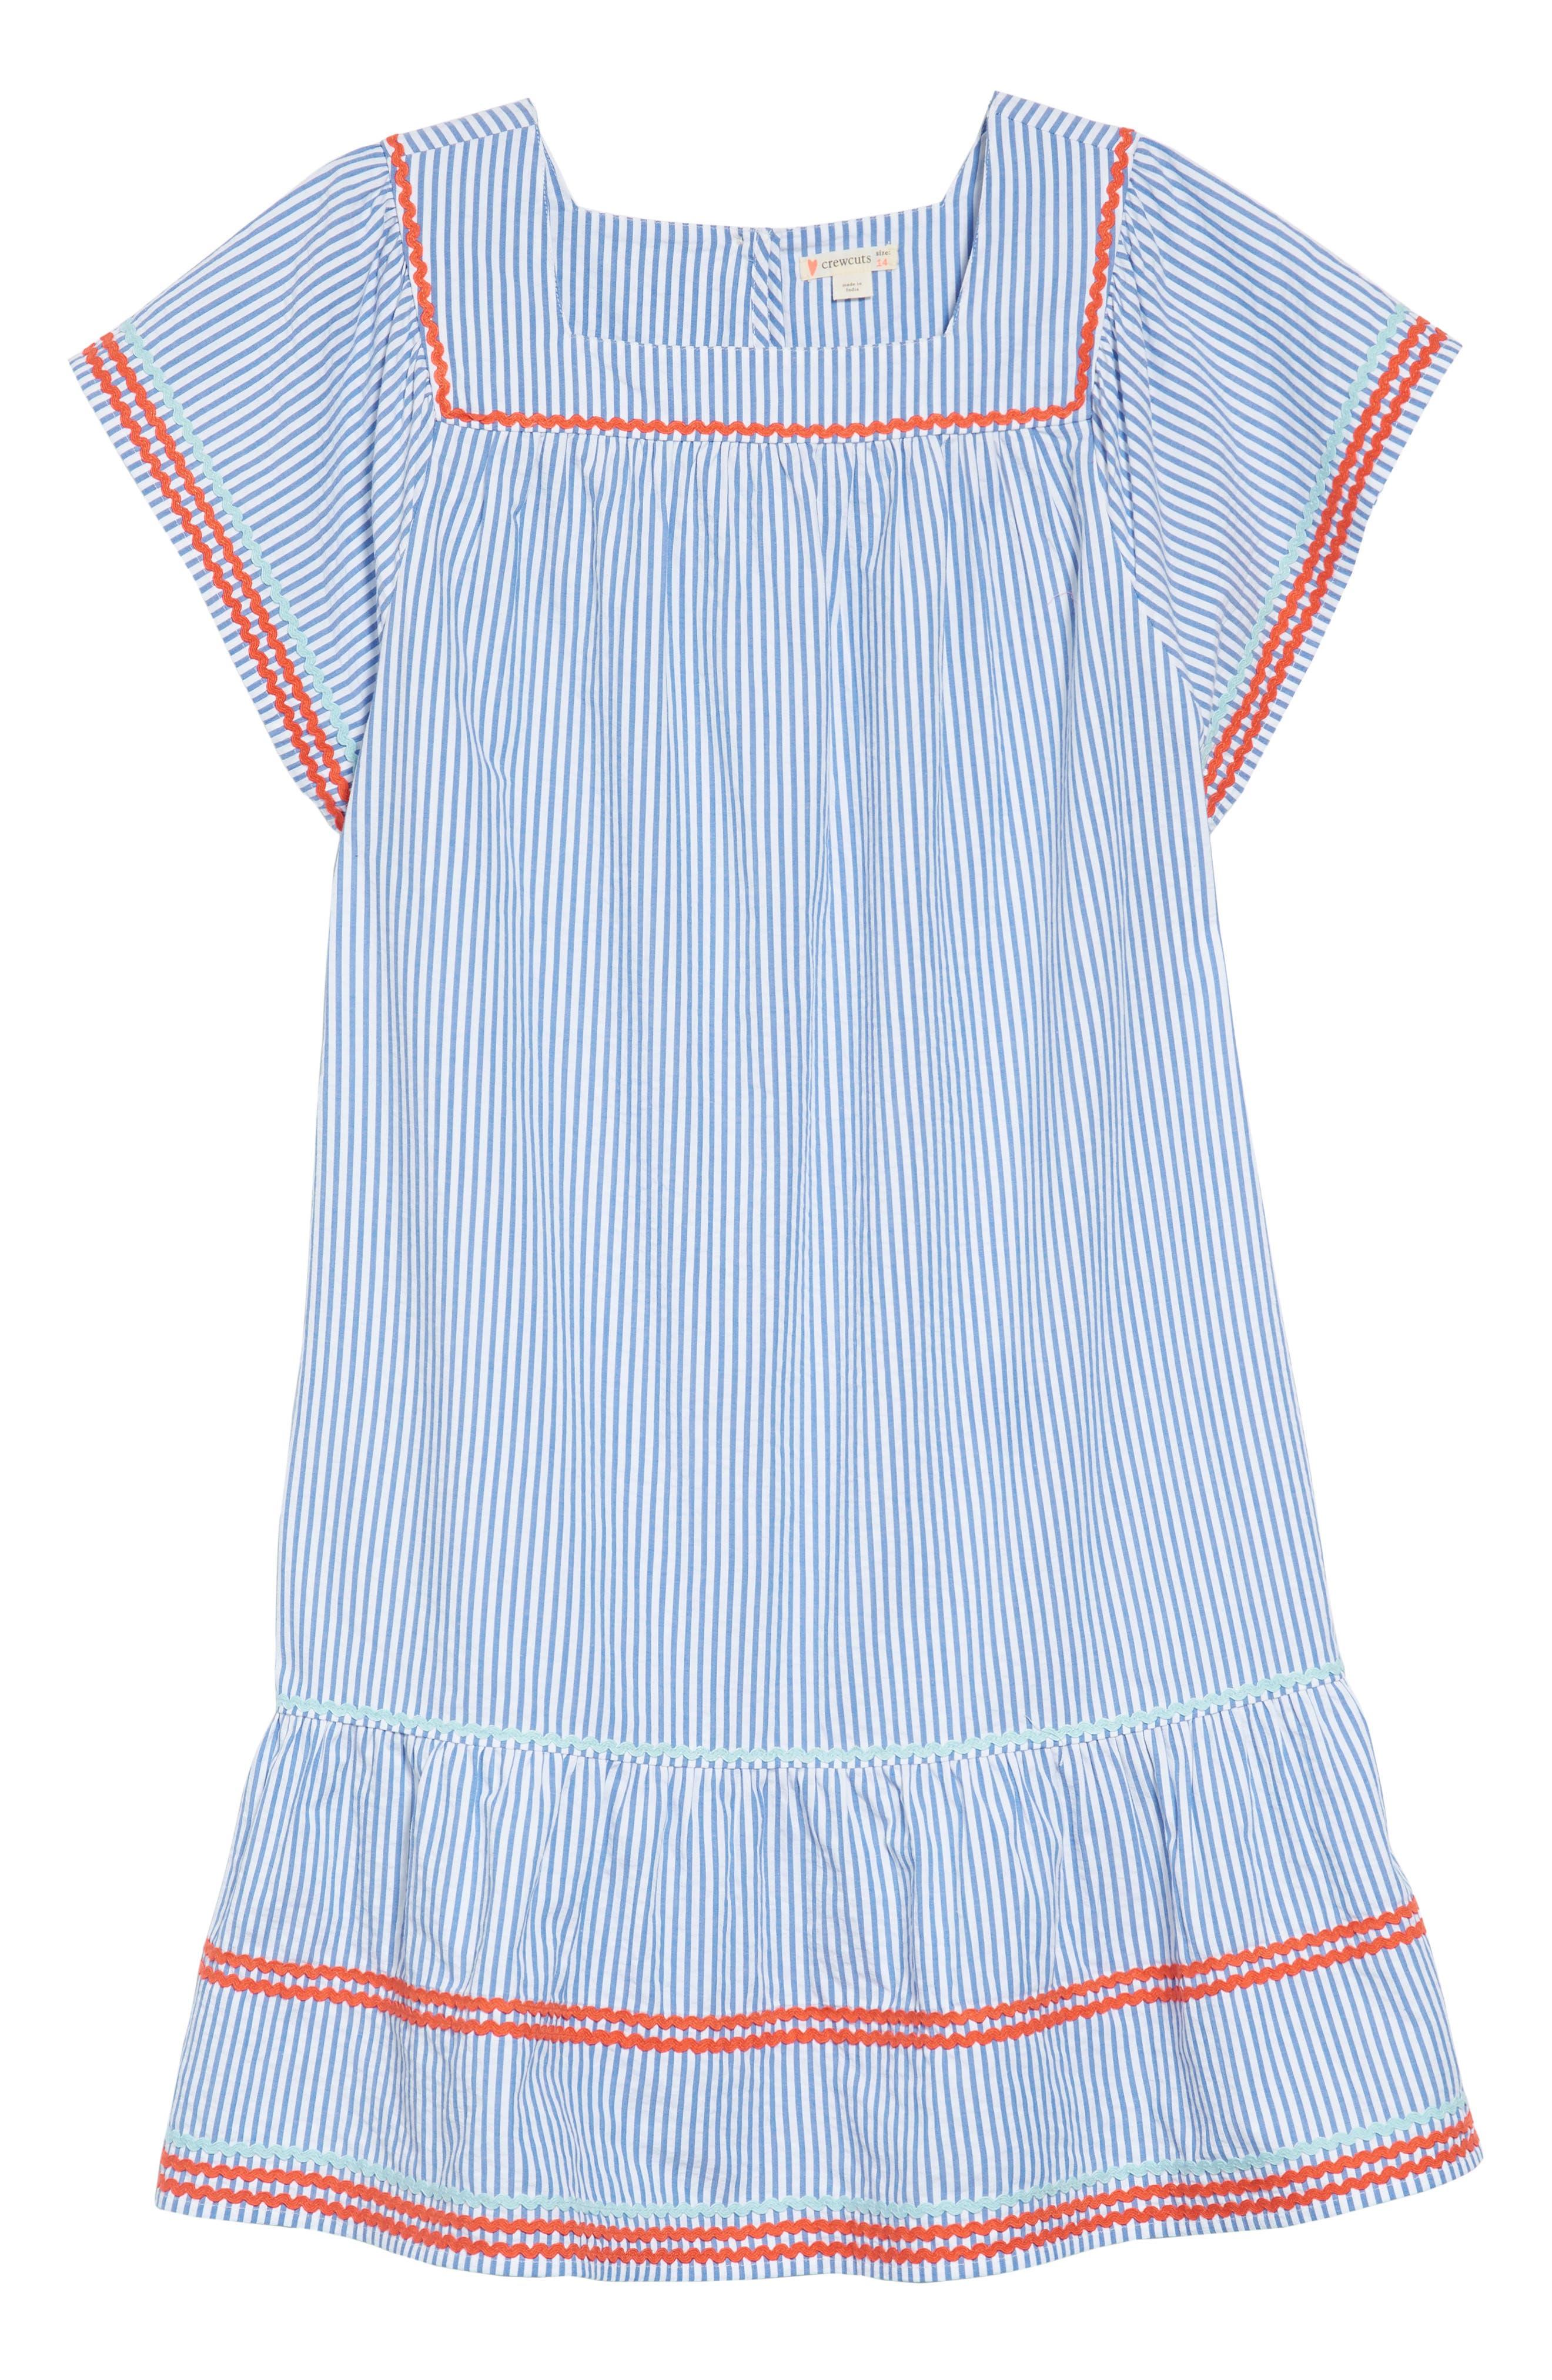 Bardot Rickrack Seersucker Dress,                             Main thumbnail 1, color,                             400